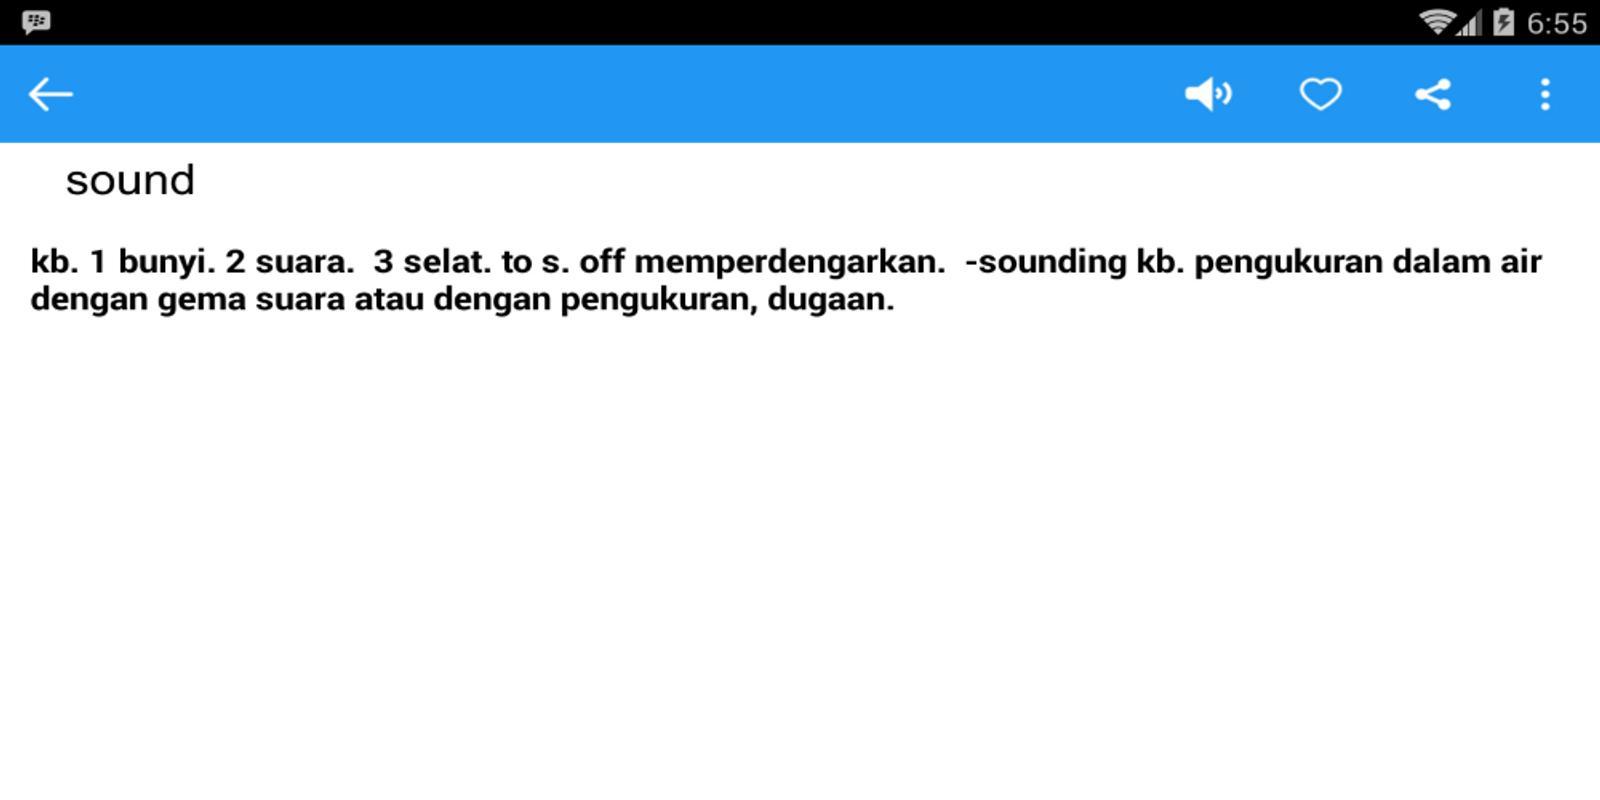 Kamus Bhasa Inggris 900 Milyar Apk: Kamus Inggris Indonesia Pro安卓下载,安卓版APK